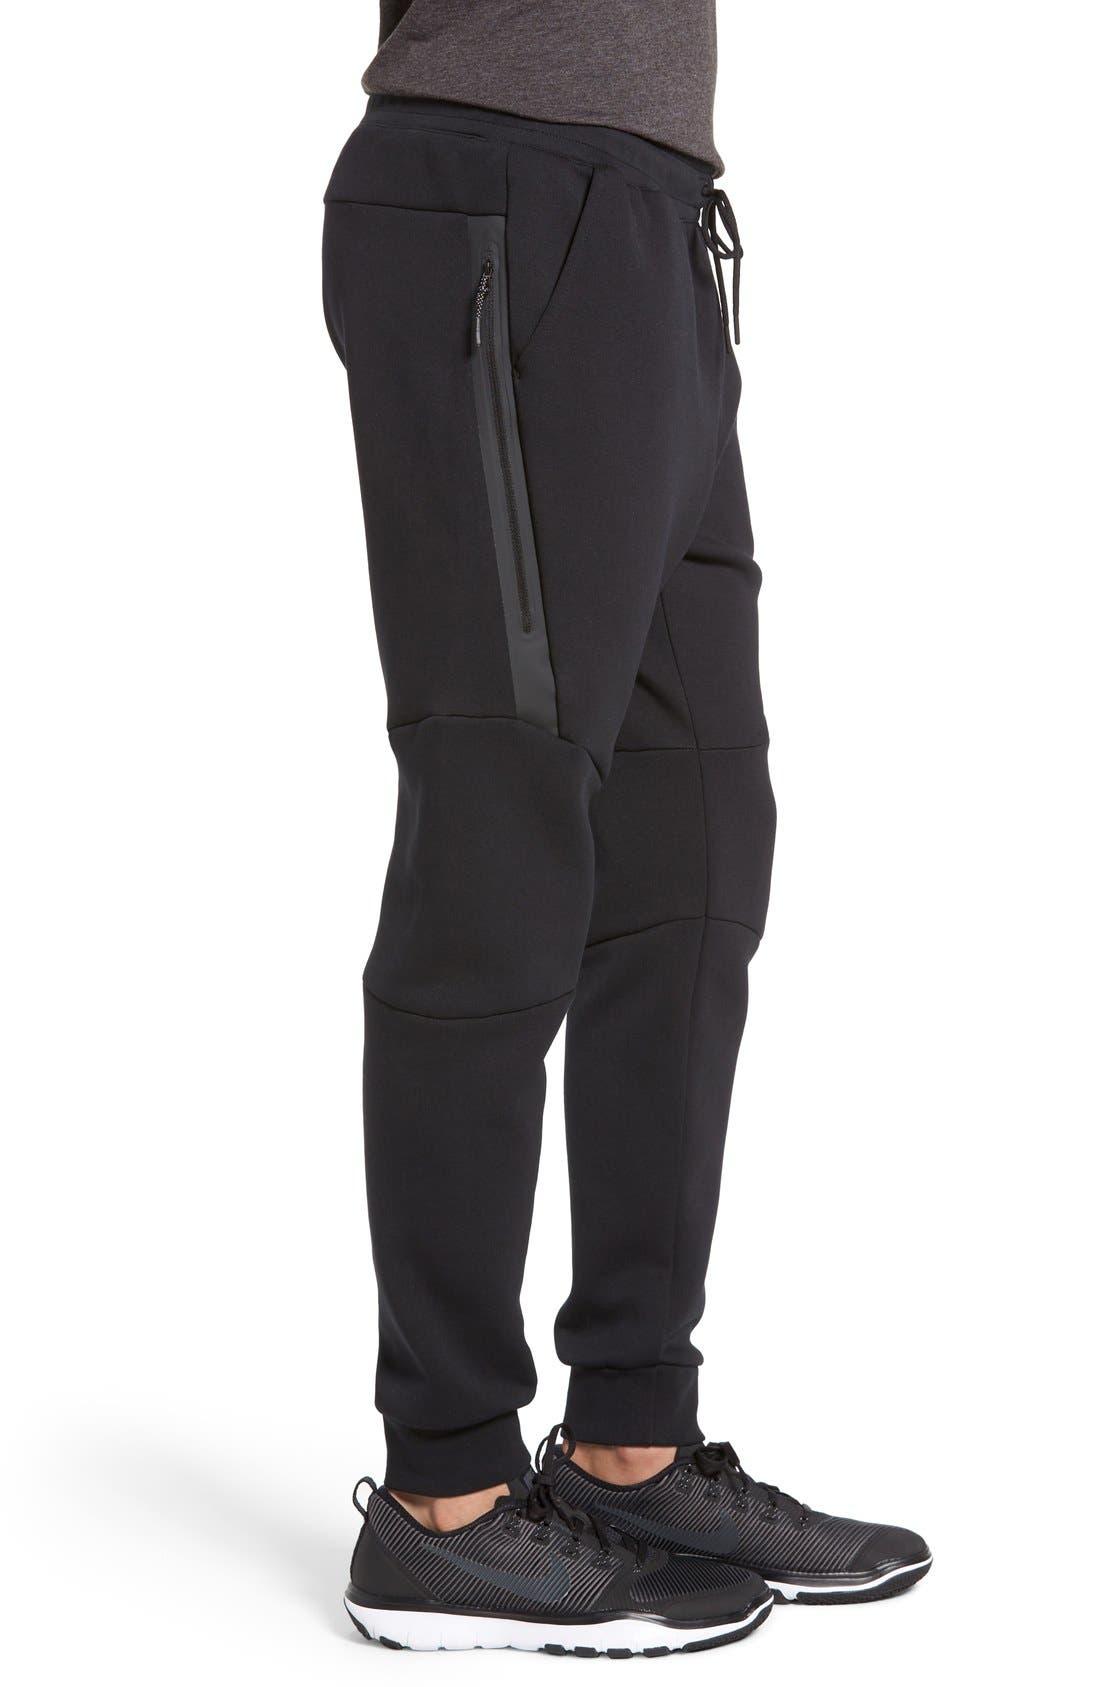 Tech Fleece Jogger Pants,                             Alternate thumbnail 4, color,                             Black/ Black